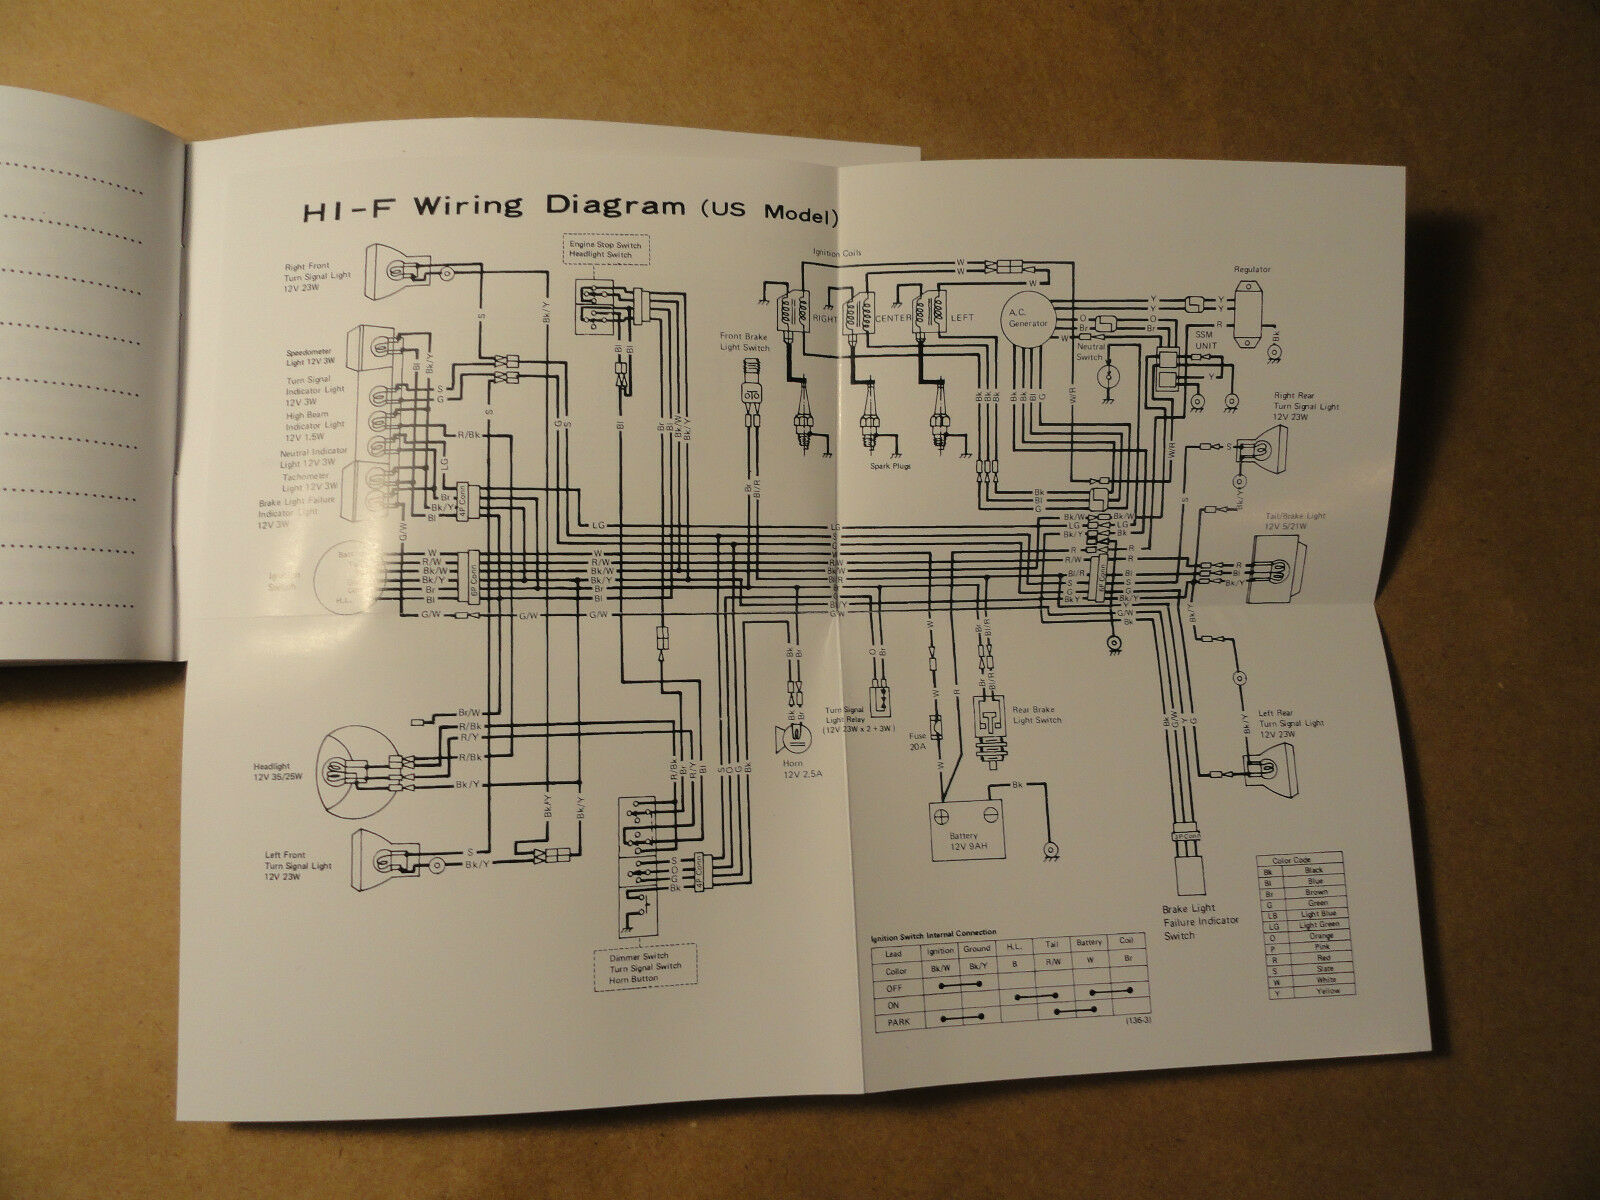 1975 Kawasaki 500 H1f Owners Manual H1 F Riders Engine Diagram 1985 Ninja 900 Handbook Shop Ebay